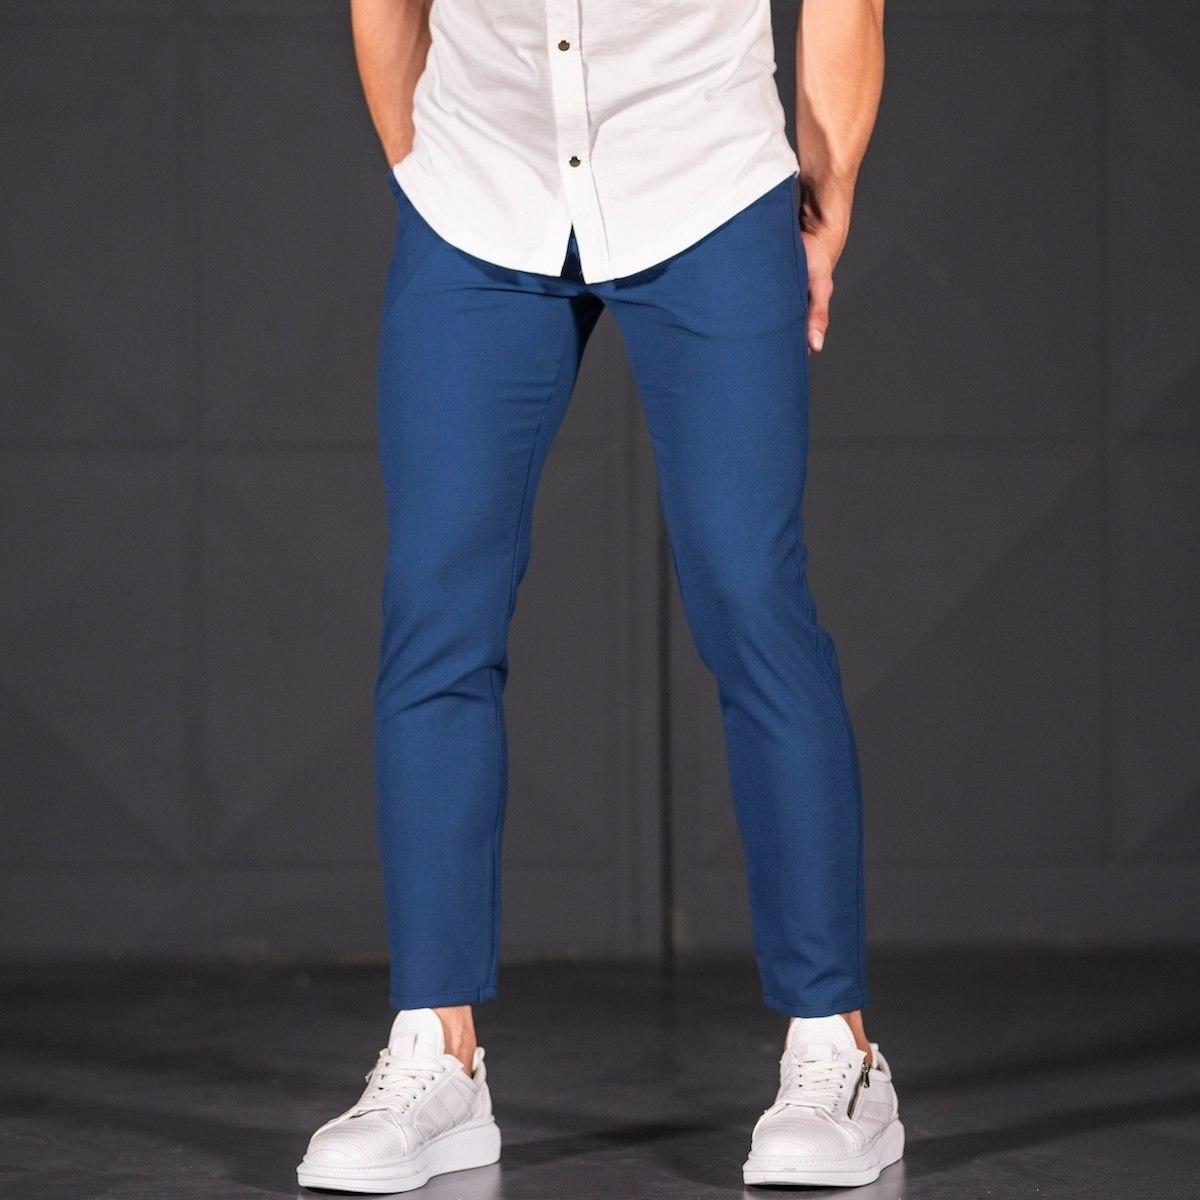 Modern Cut Trousers In Navy Blue Mv Premium Brand - 2